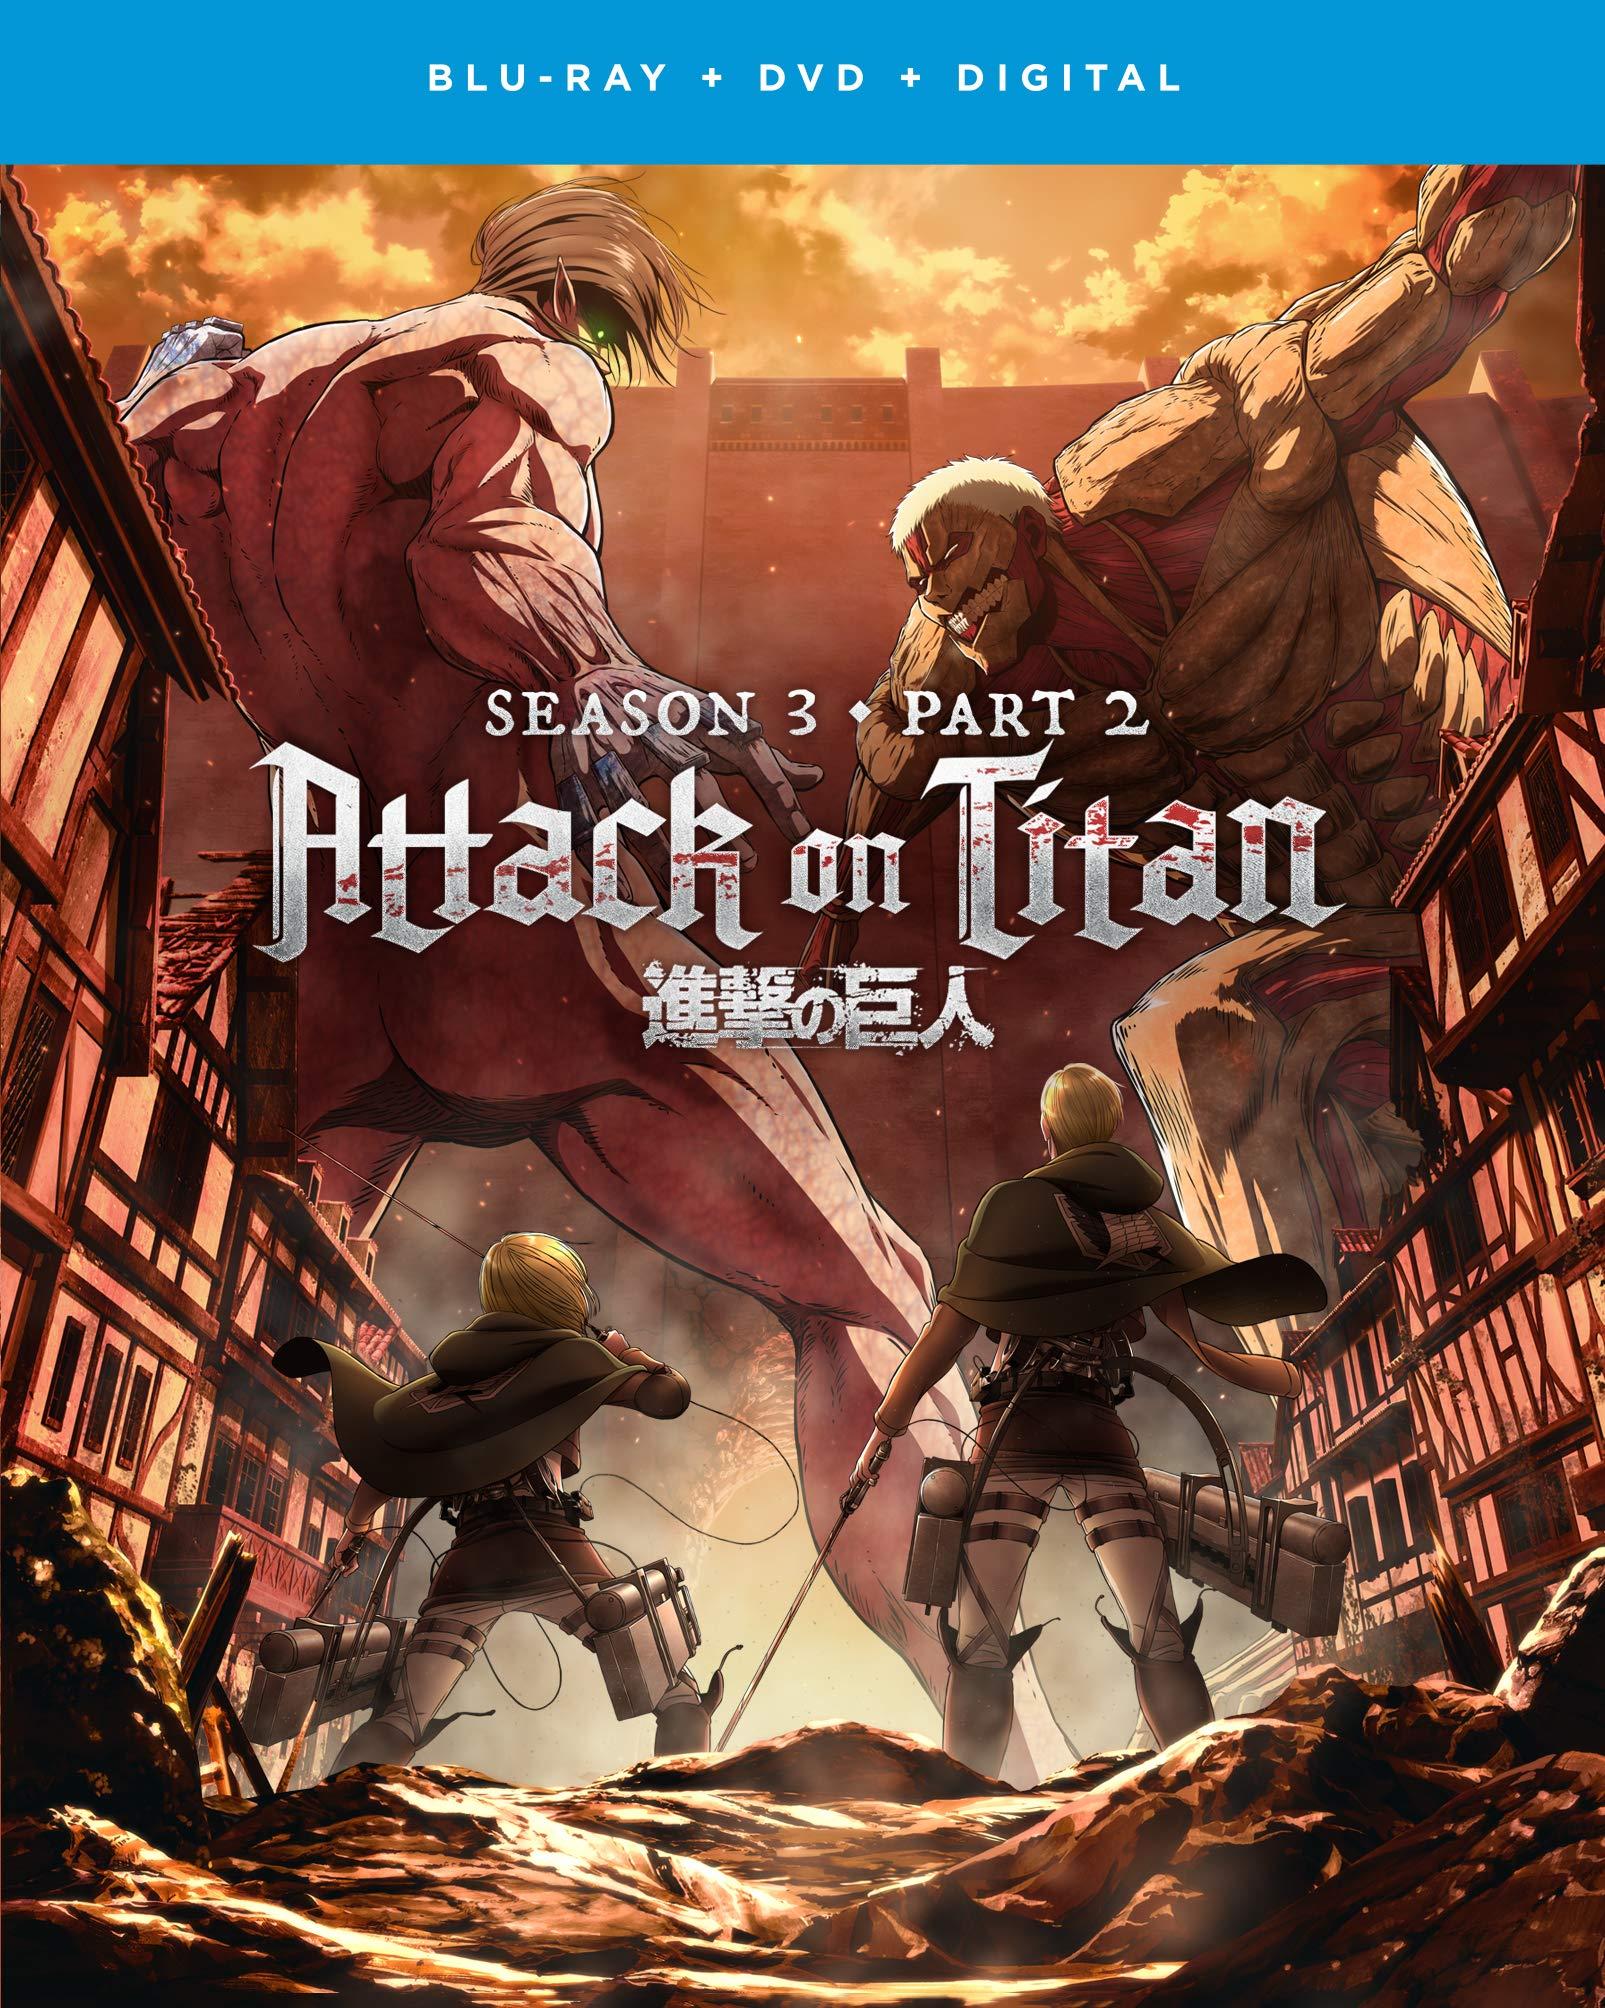 Attack on Titan: Season 3, Part 2 (Blu-ray / DVD Combo ...